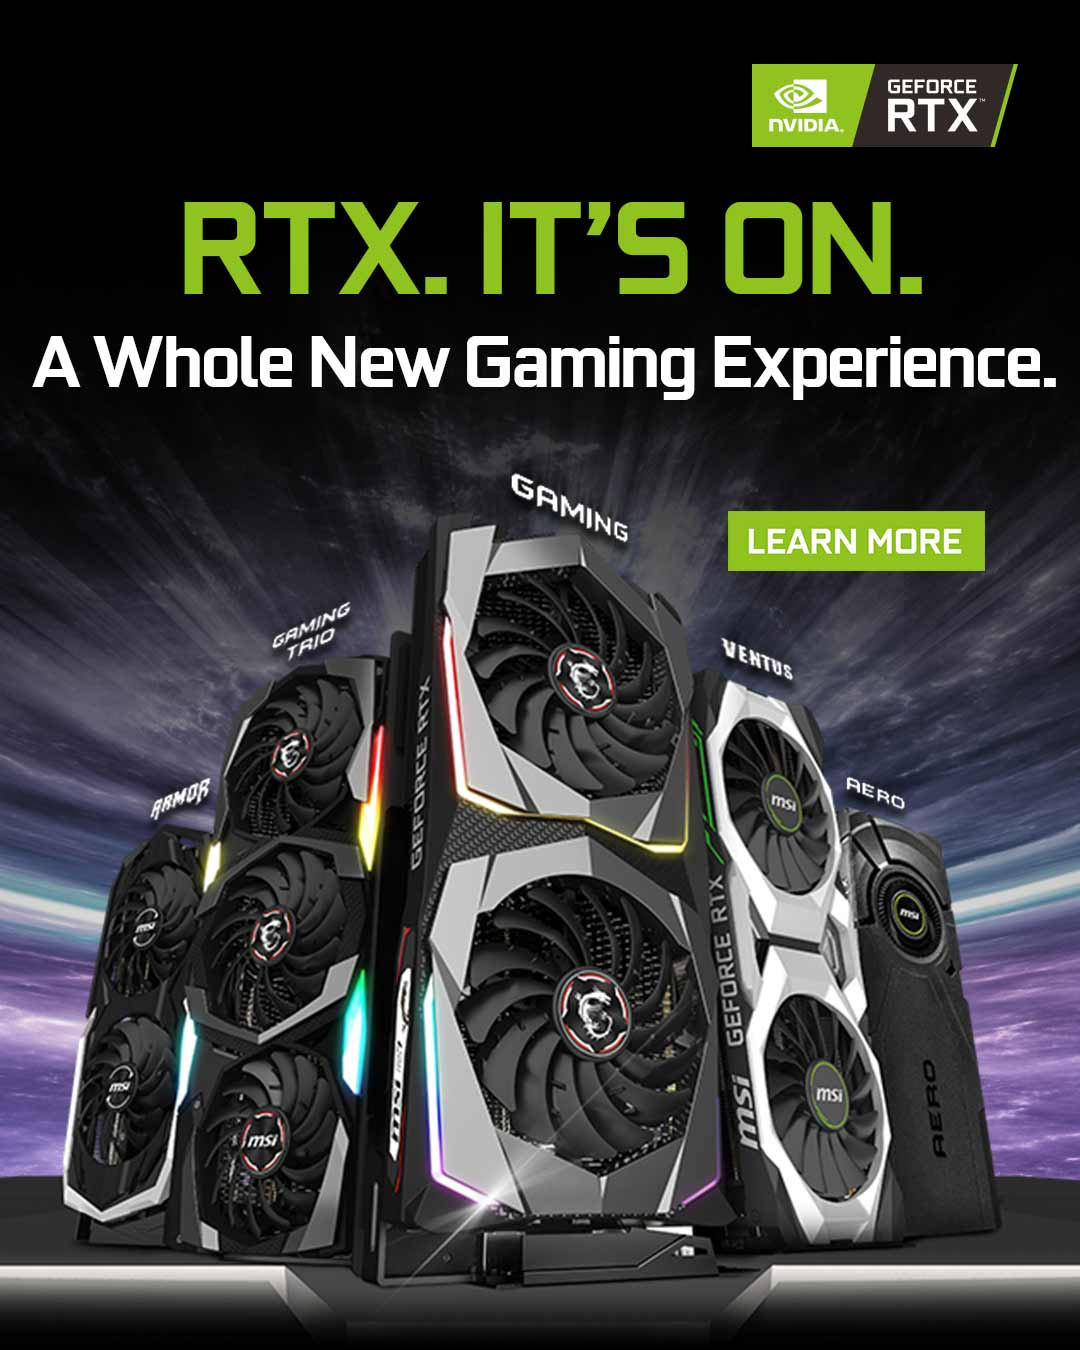 RTX. IT'S ON.